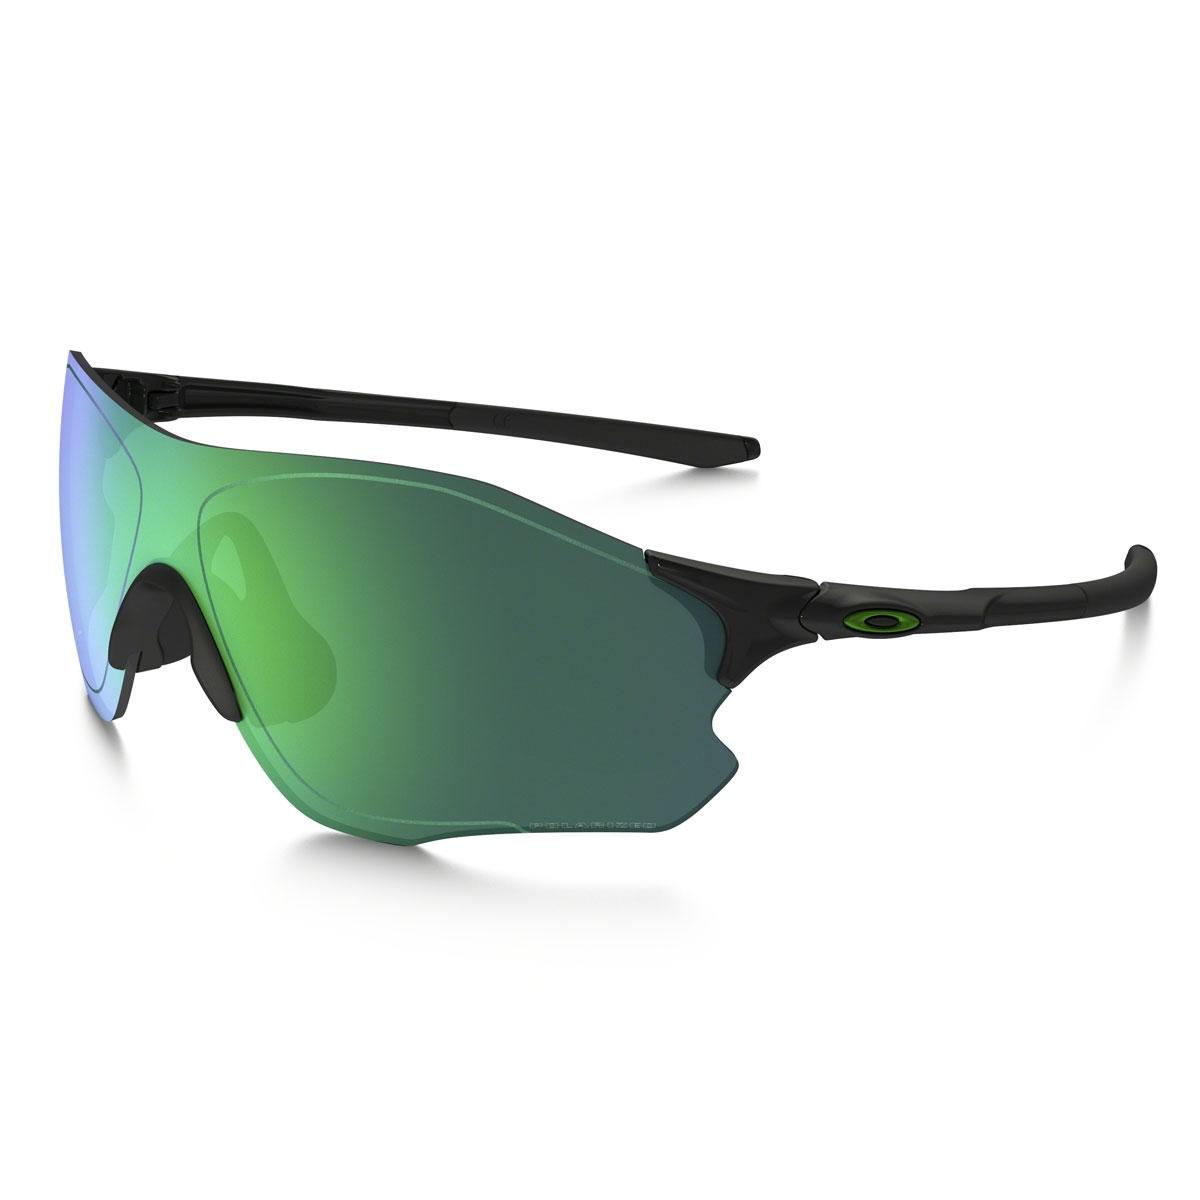 fad304d1d60 Image of Oakley EVZero Path Polarized Sunglasses - Polished Black Jade  Iridium Polarized